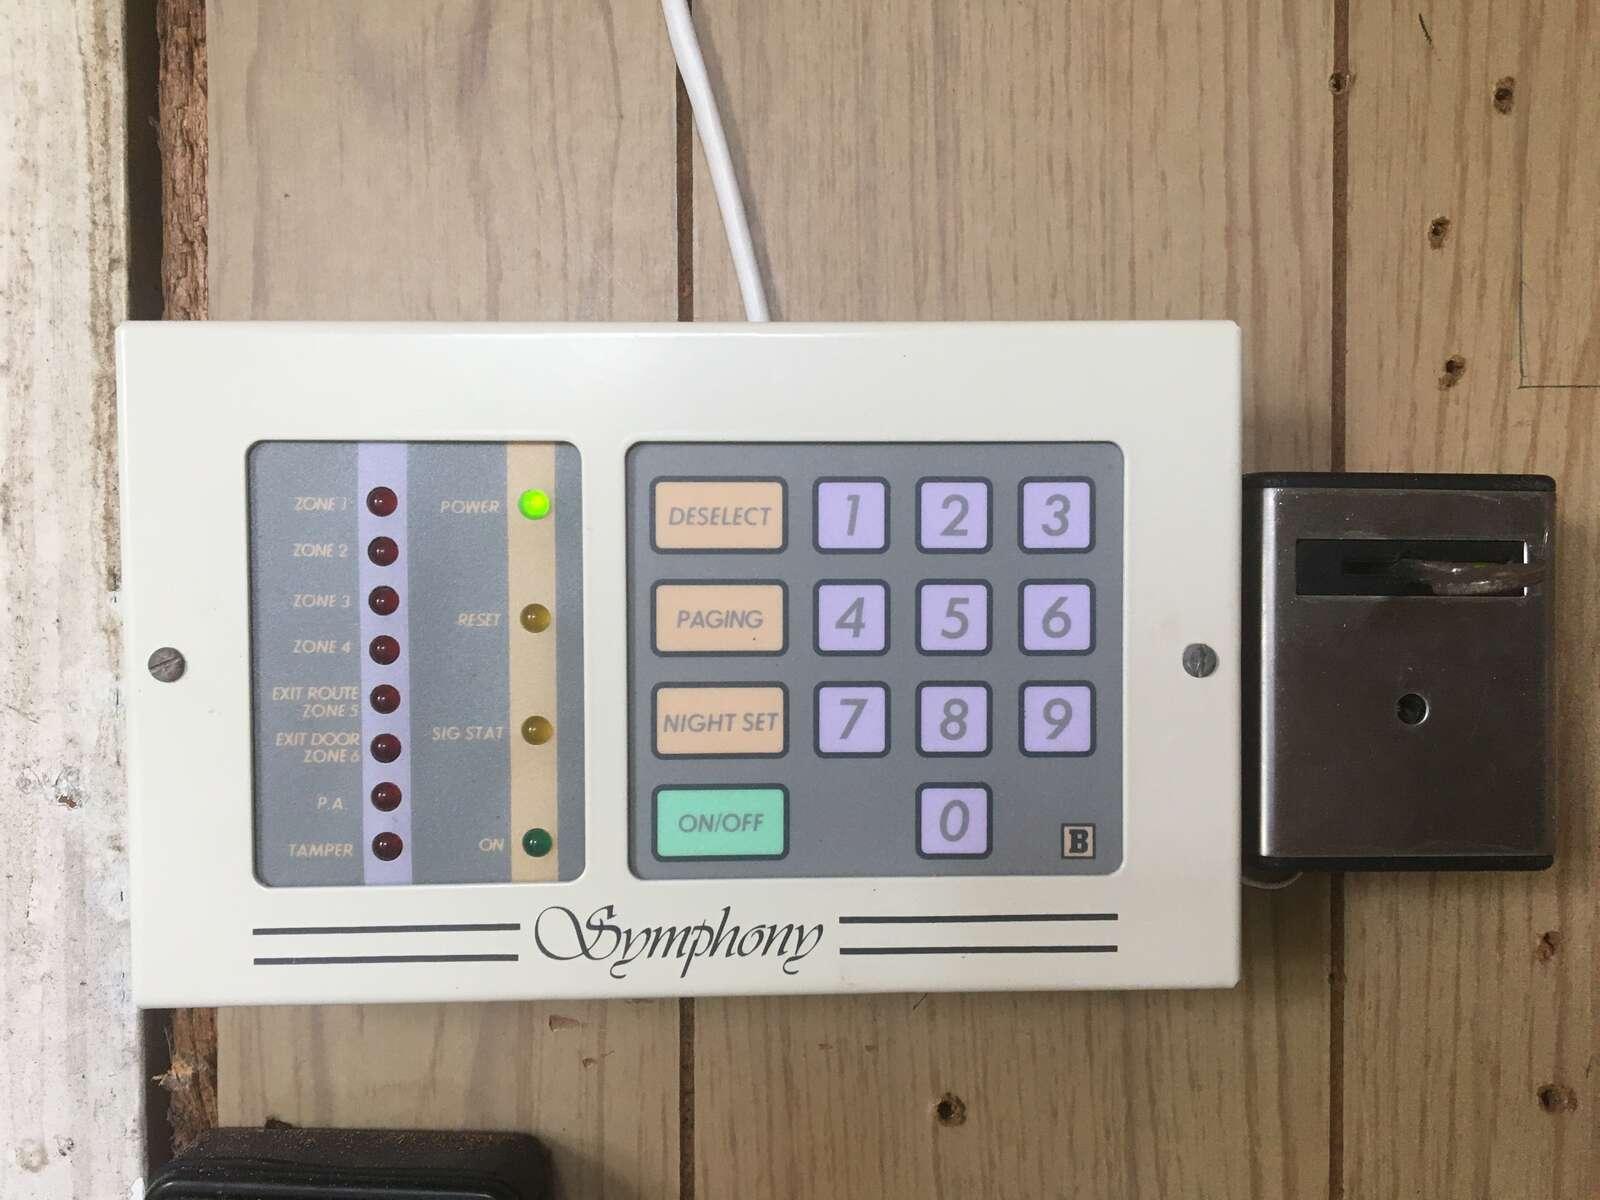 Bentley Symphony Alarm System Remote Keypad